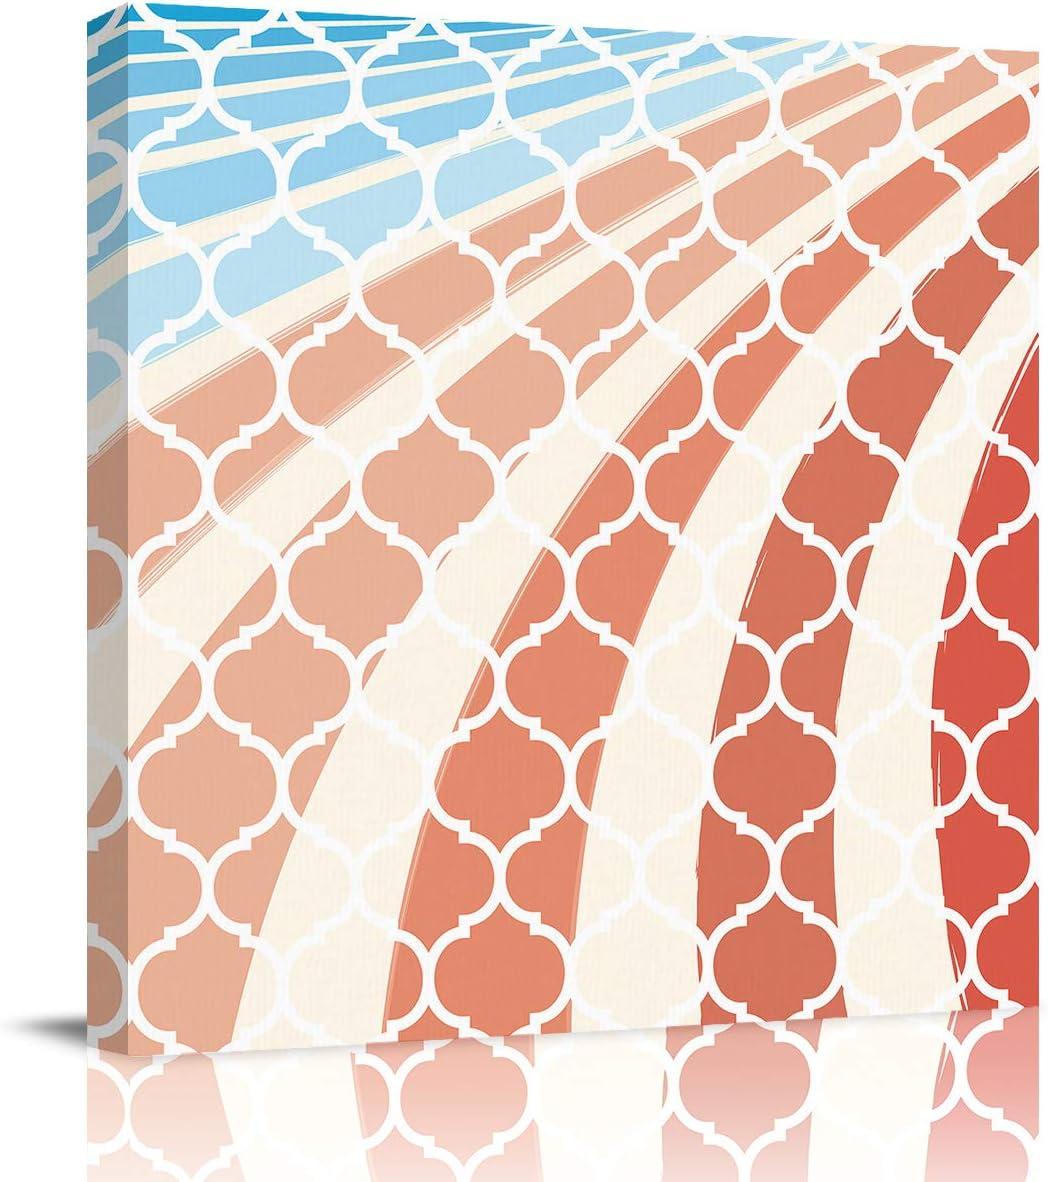 Max 60% OFF Genuine Free Shipping VCFUN Canvas Wall Art Painting Moroccan Artwork Plaid Decor Pi